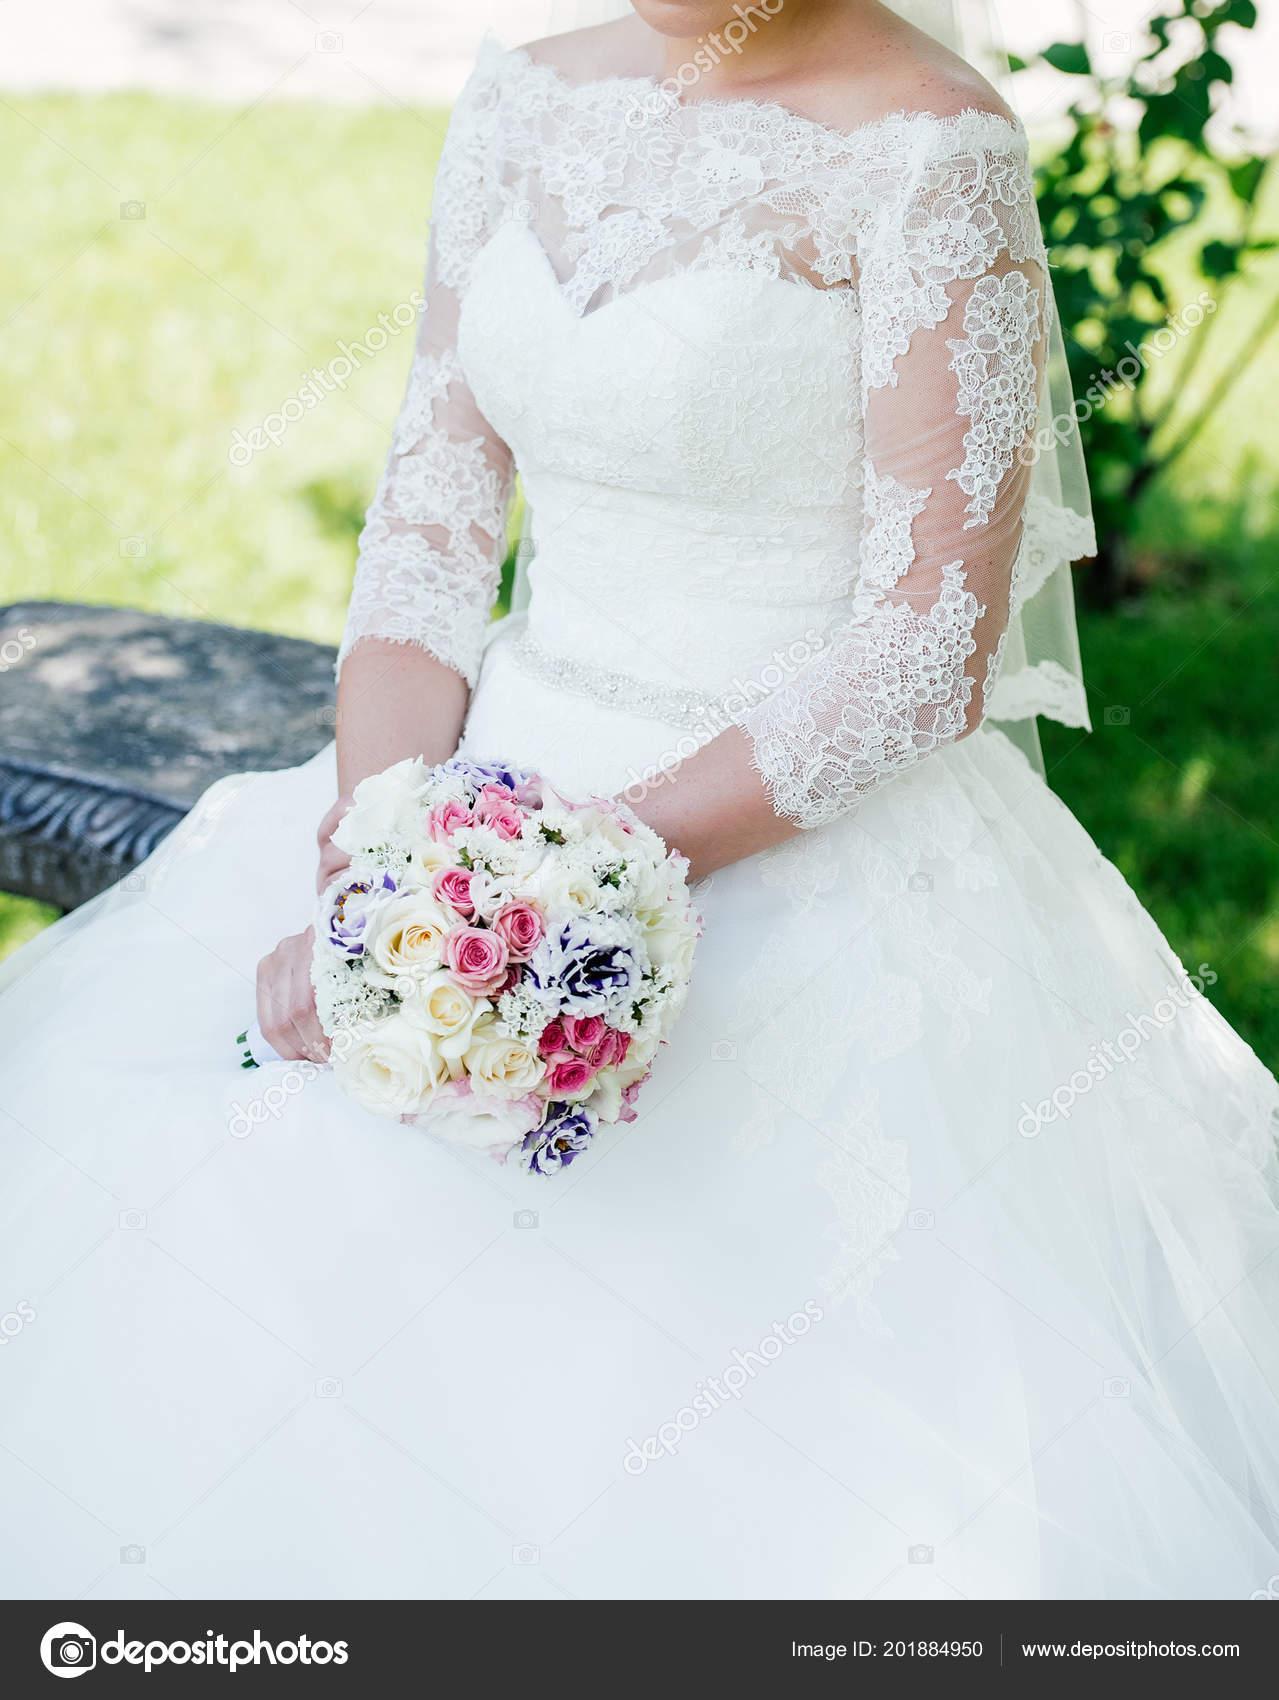 Beautiful Bride White Lace Wedding Dress Wedding Bouquet Cream